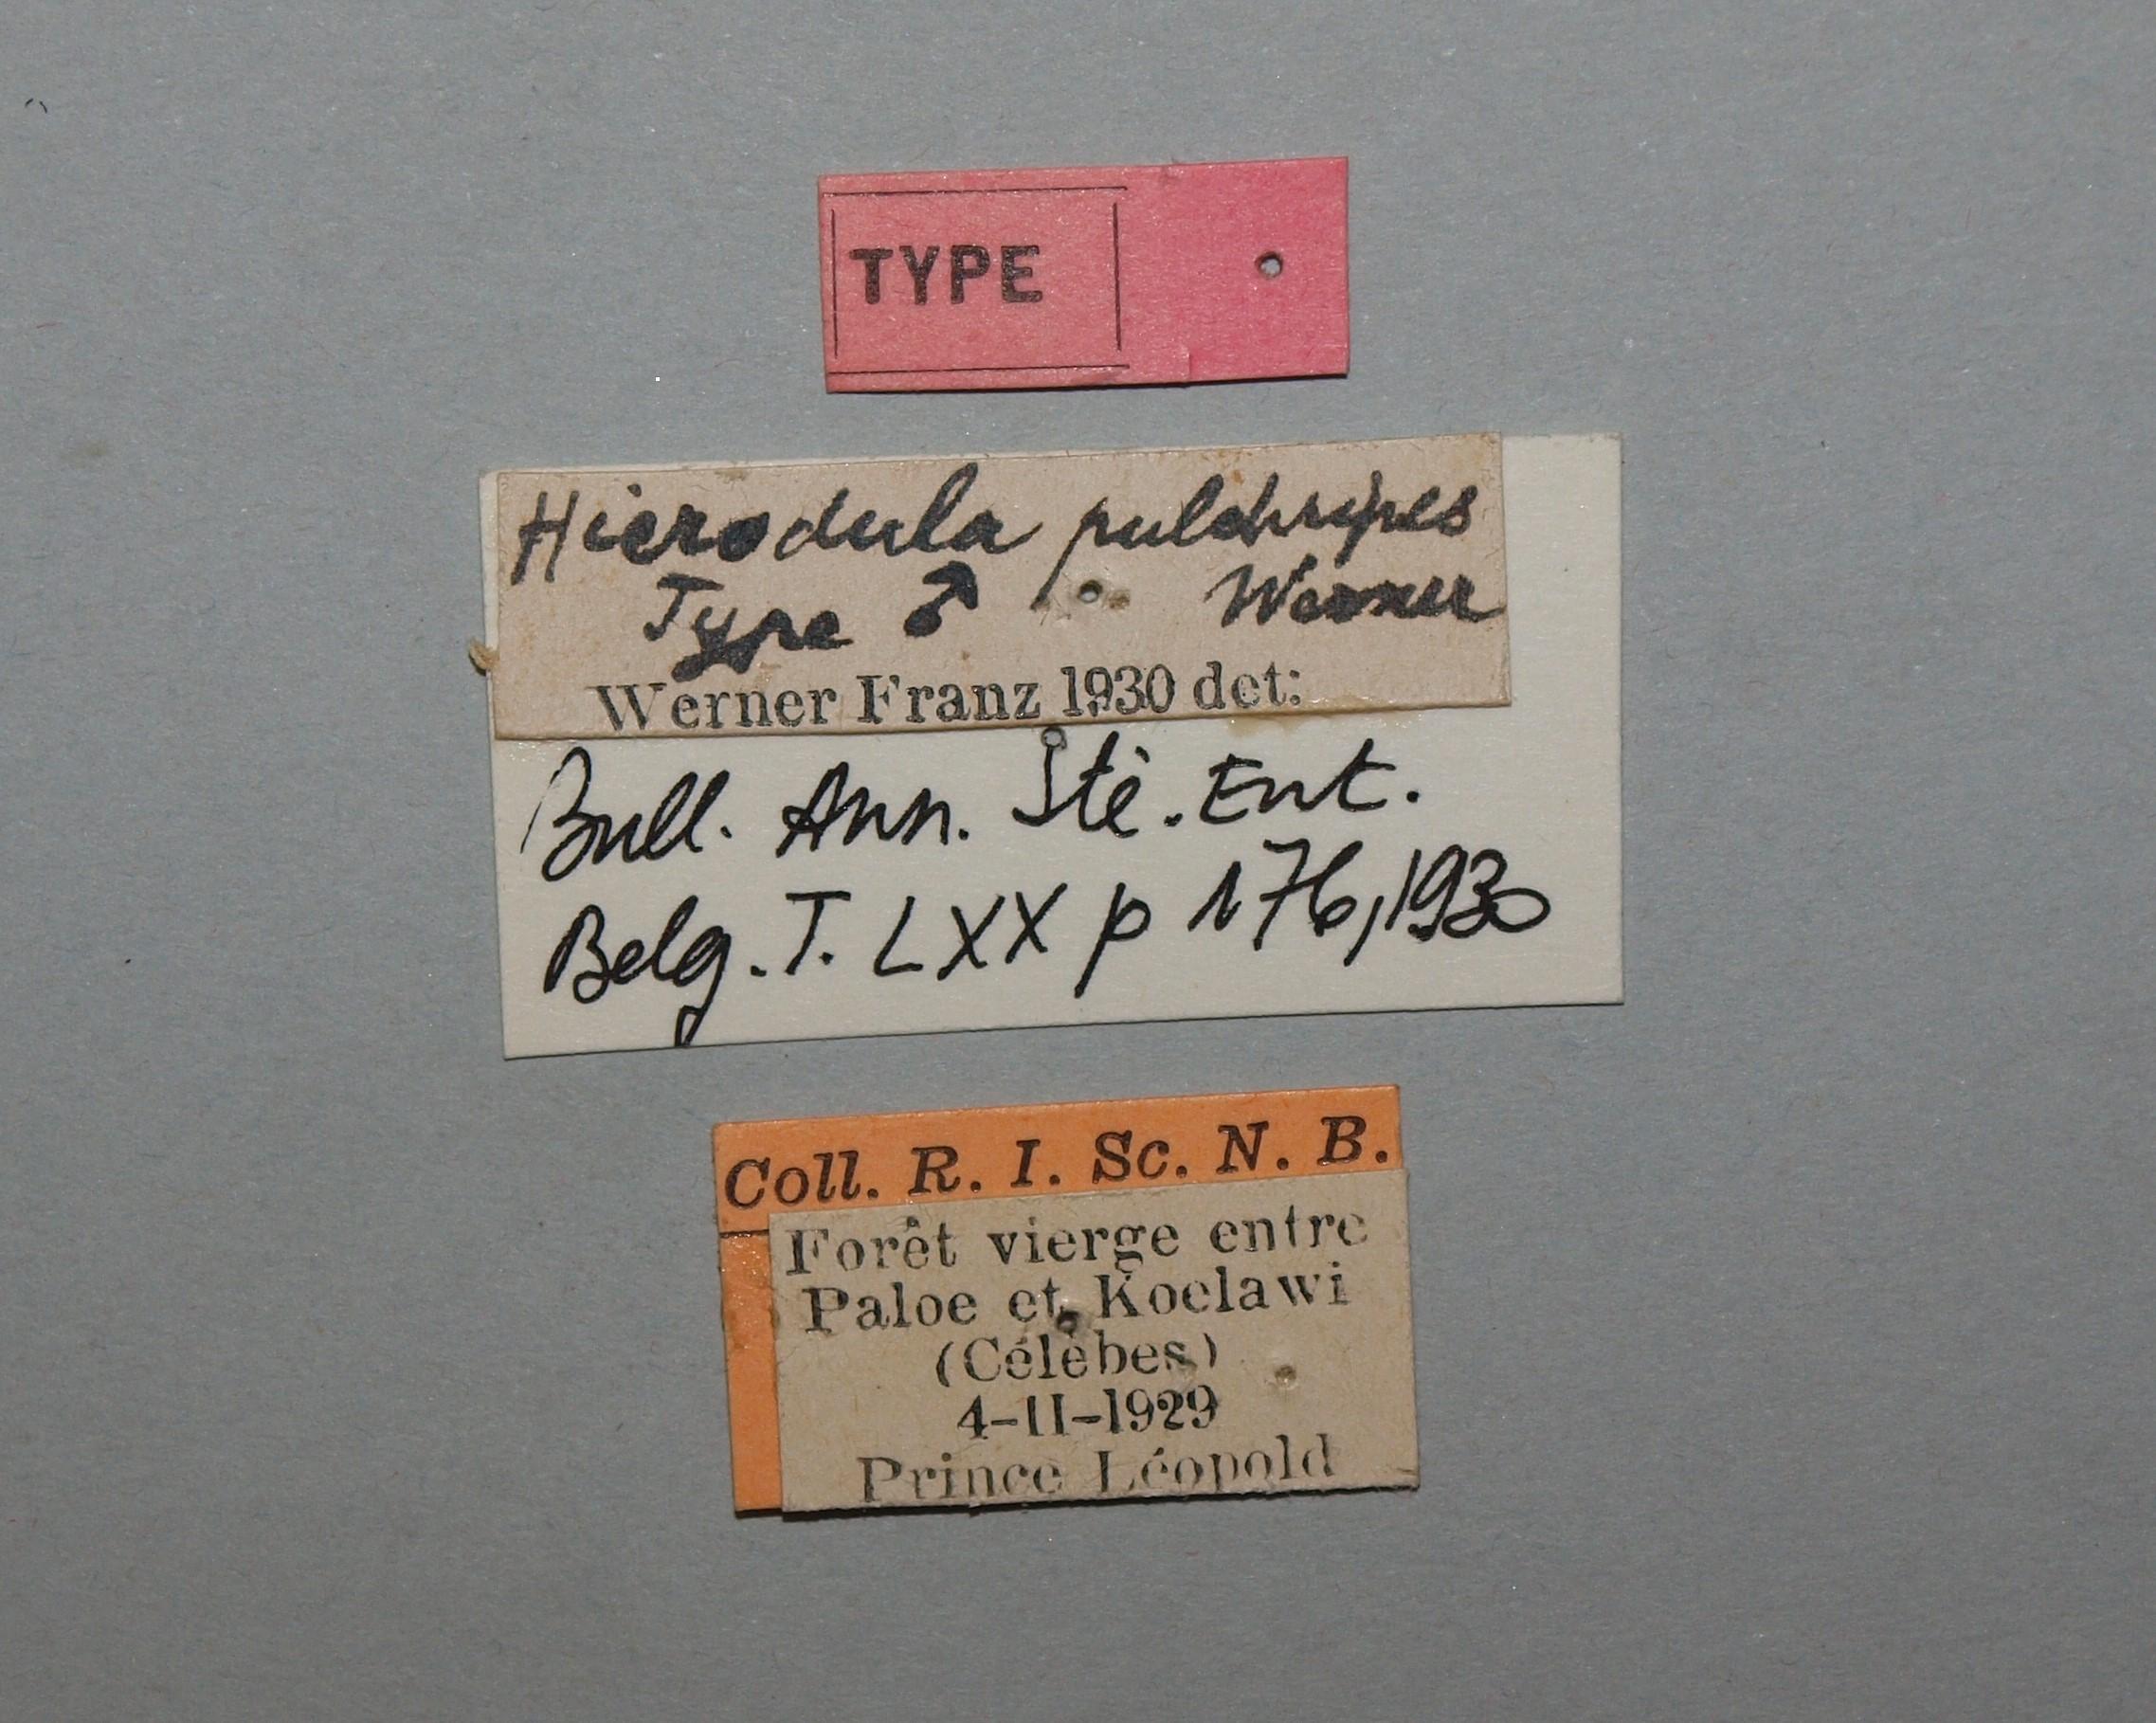 Hierodula pulchripes t.JPG